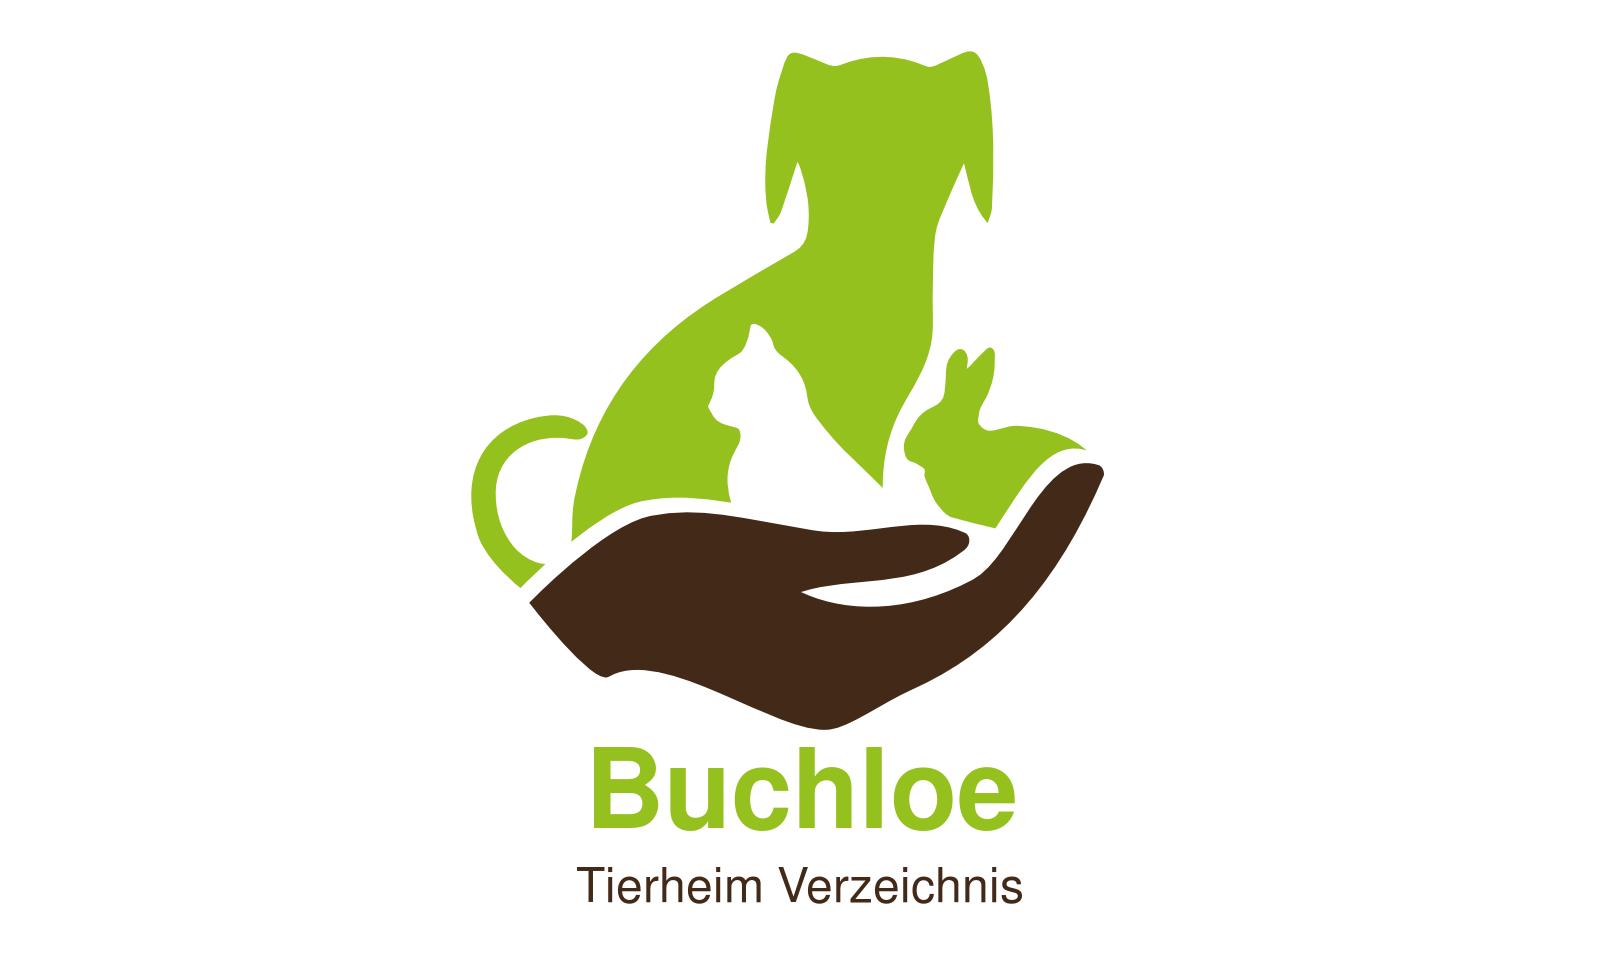 Tierheim Buchloe